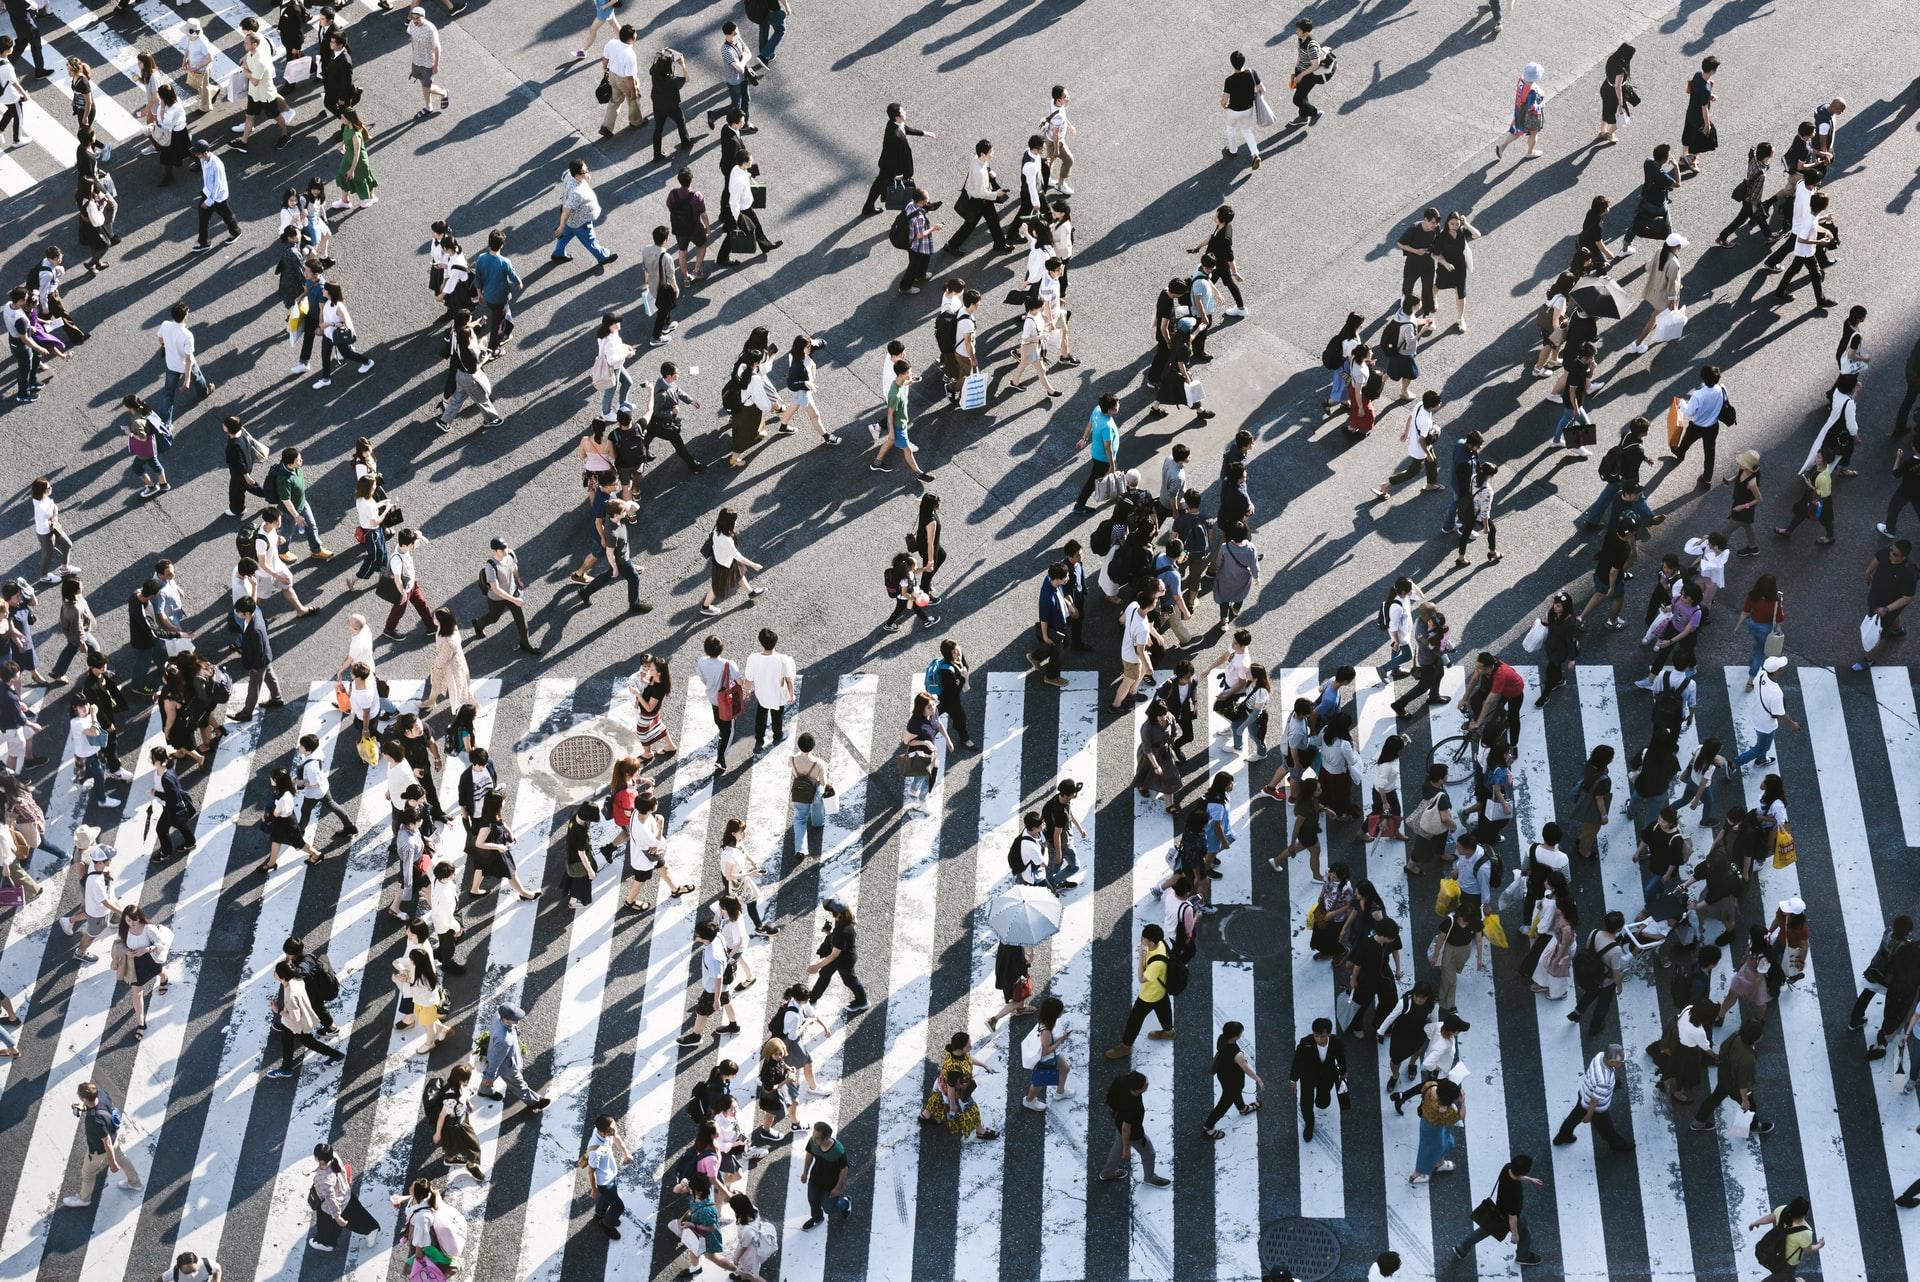 people walking through a crosswalk